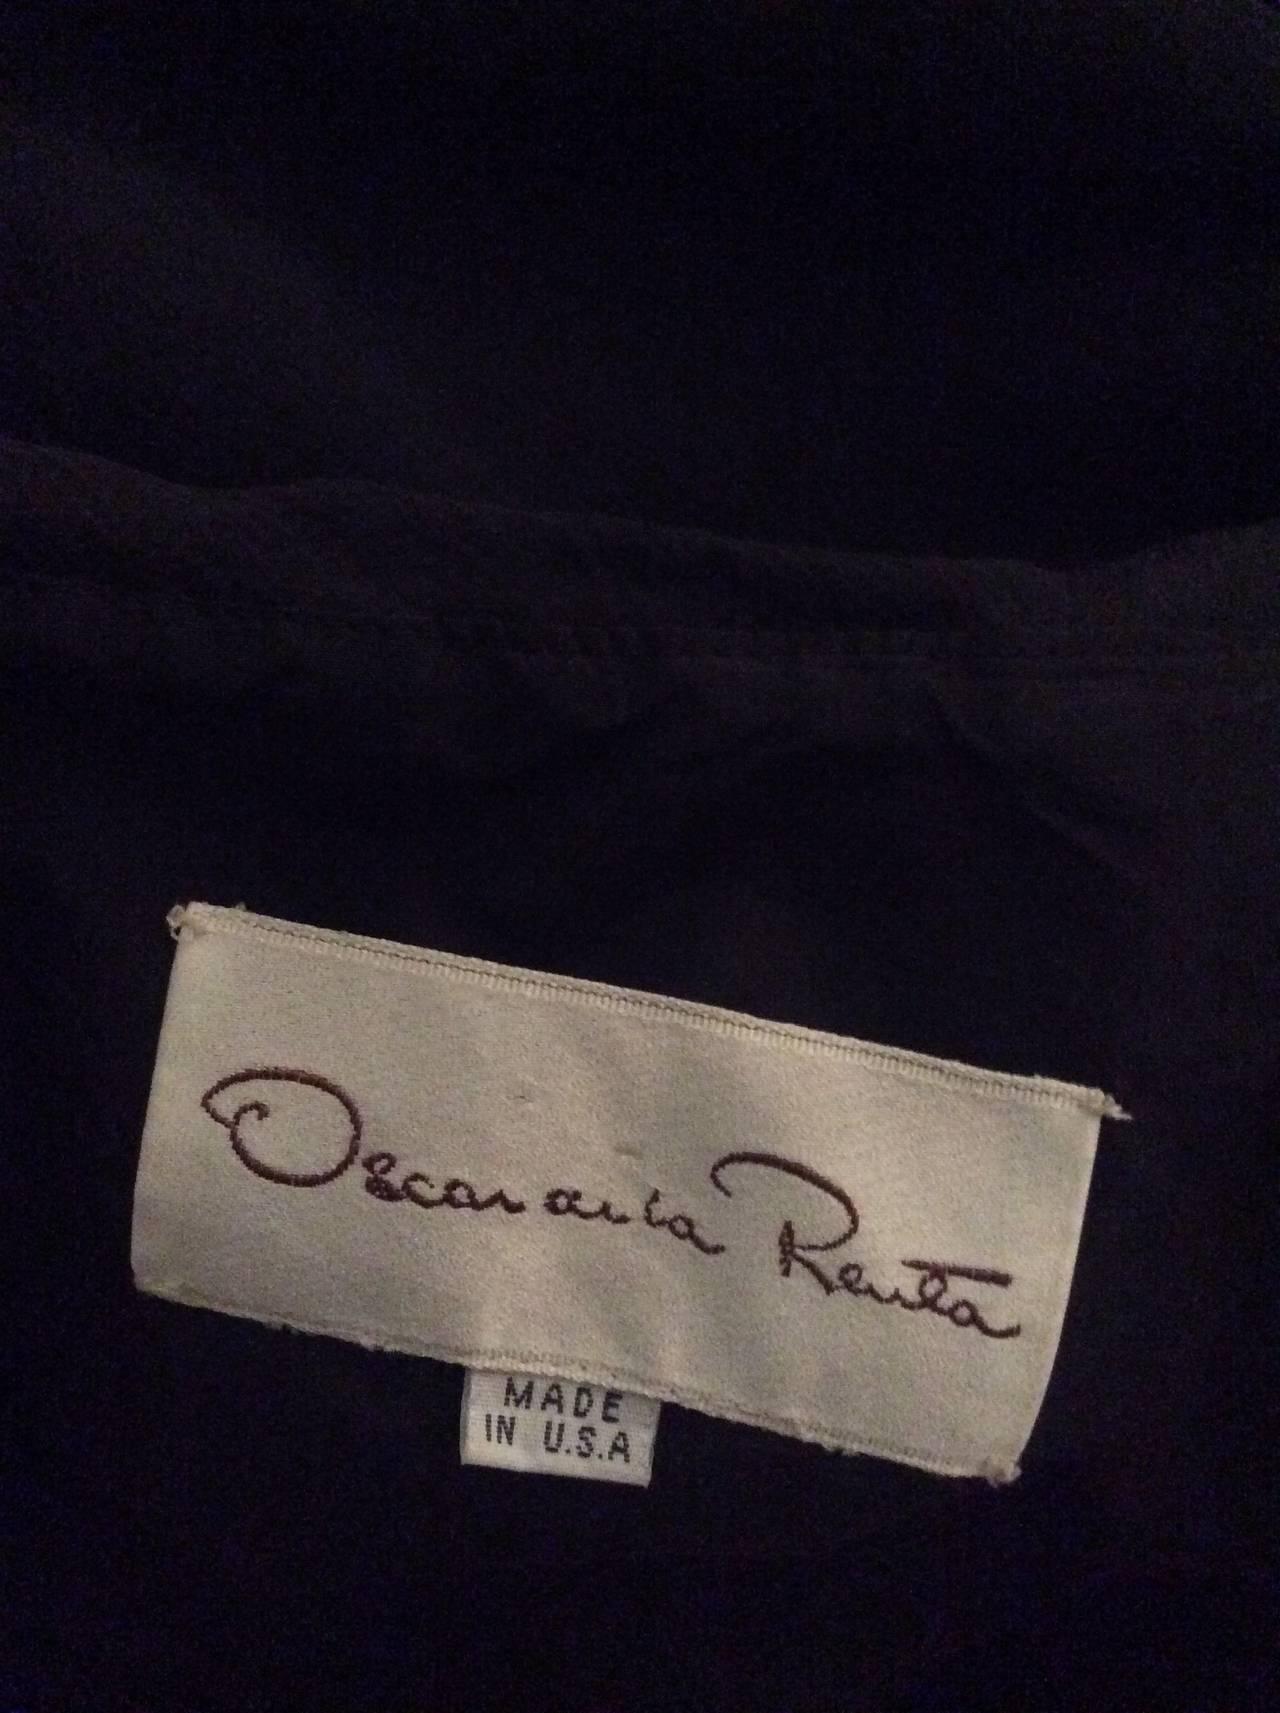 Remarkable Vintage Oscar de la Renta Black Velvet & Chiffon Grecian Gown 8